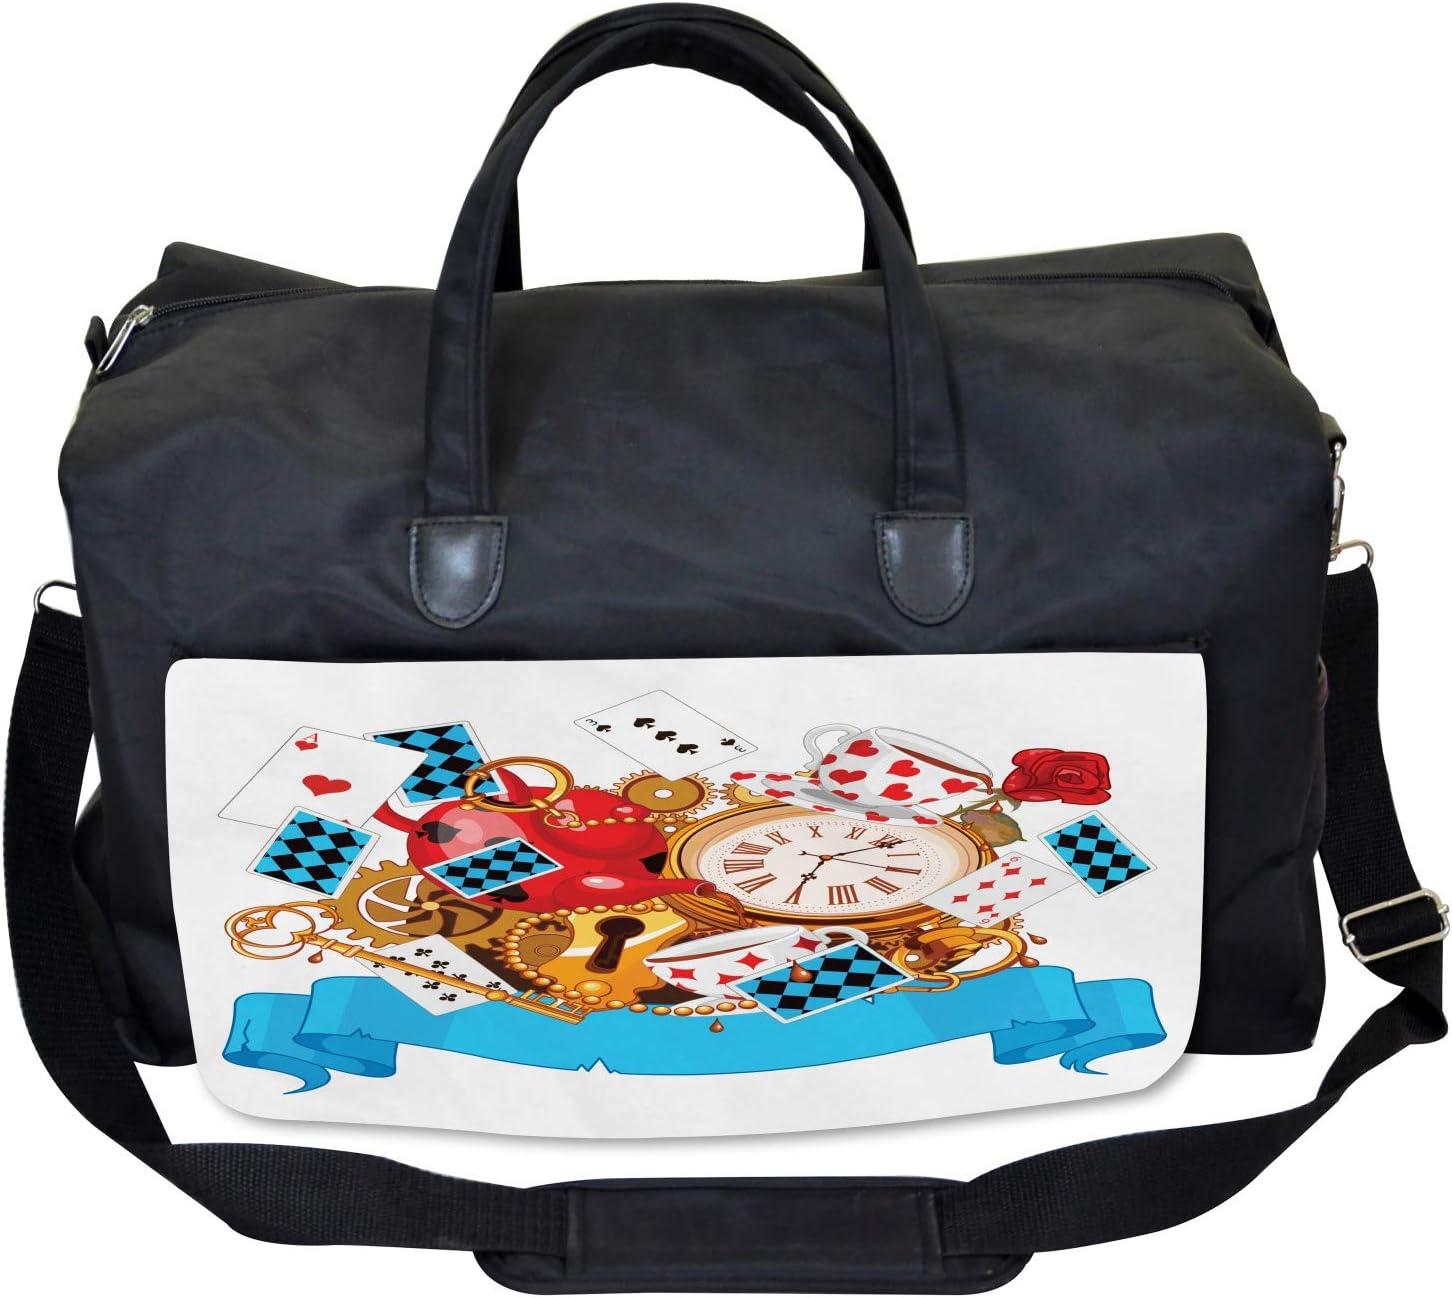 Fantasy World Large Weekender Carry-on Ambesonne Cartoon Gym Bag